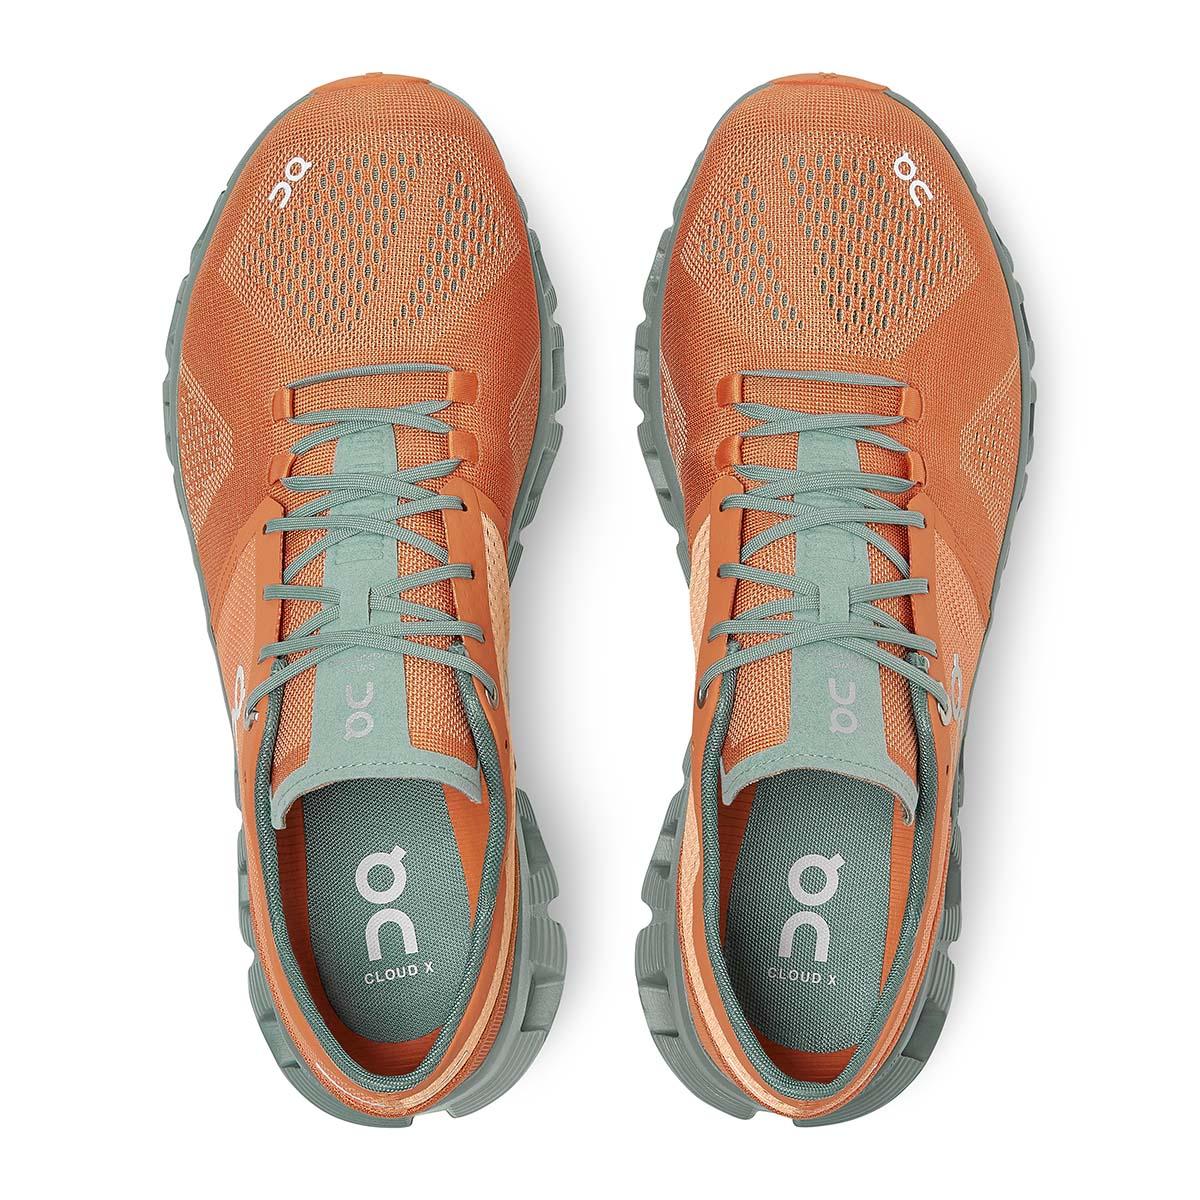 Men's On Cloud X 2.0 Running Shoe - Color: Orange/Sea - Size: 7 - Width: Regular, Orange/Sea, large, image 4